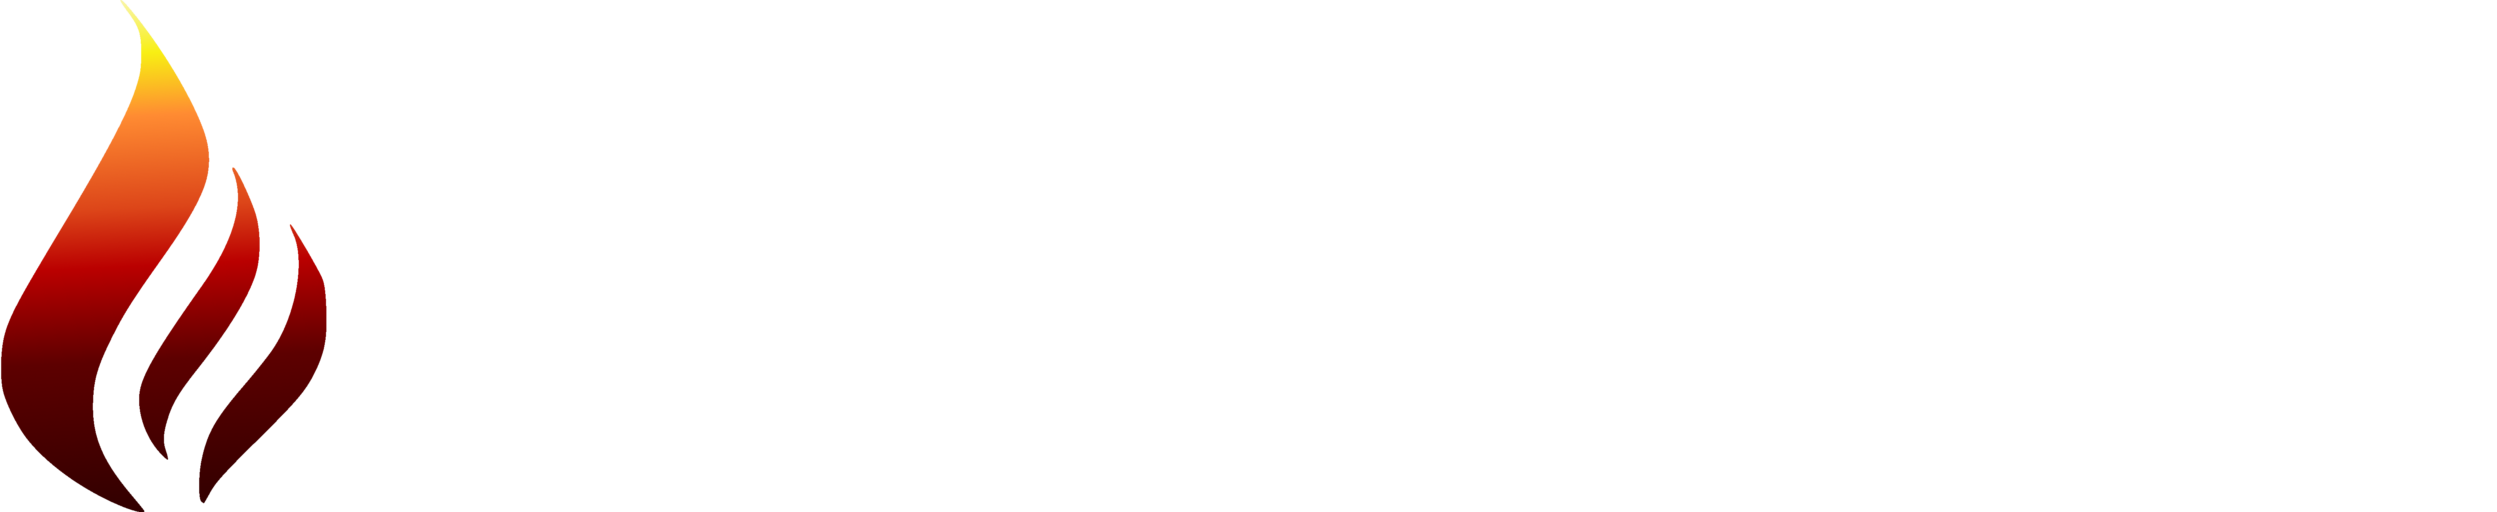 Firenibbler Studios